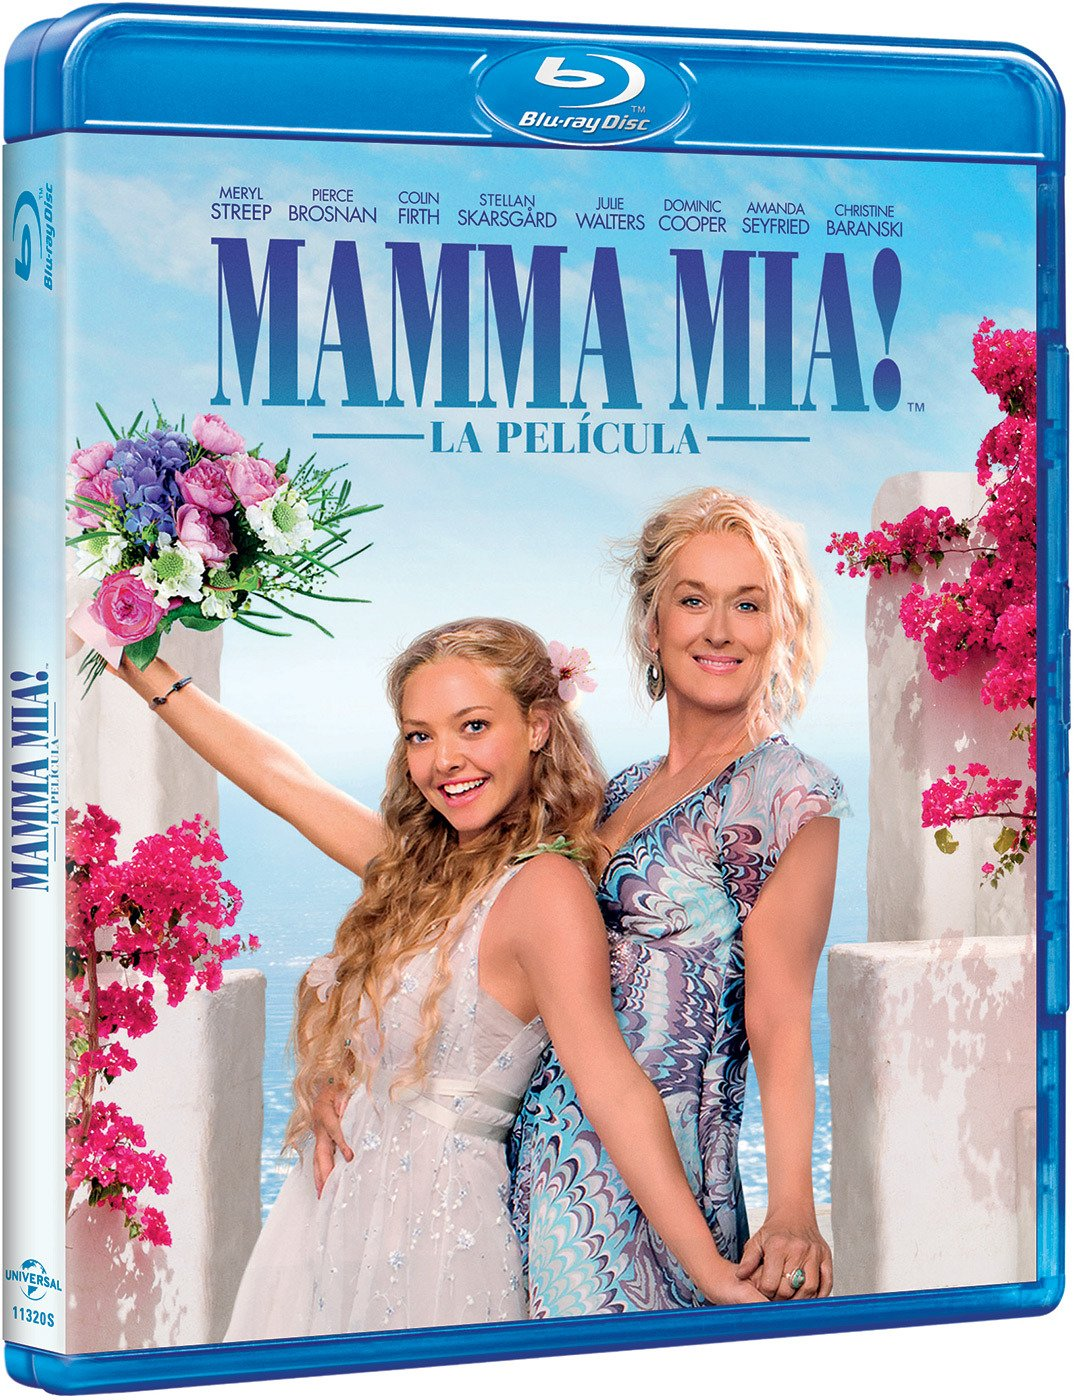 Mamma Mia 2018 [Blu-ray]